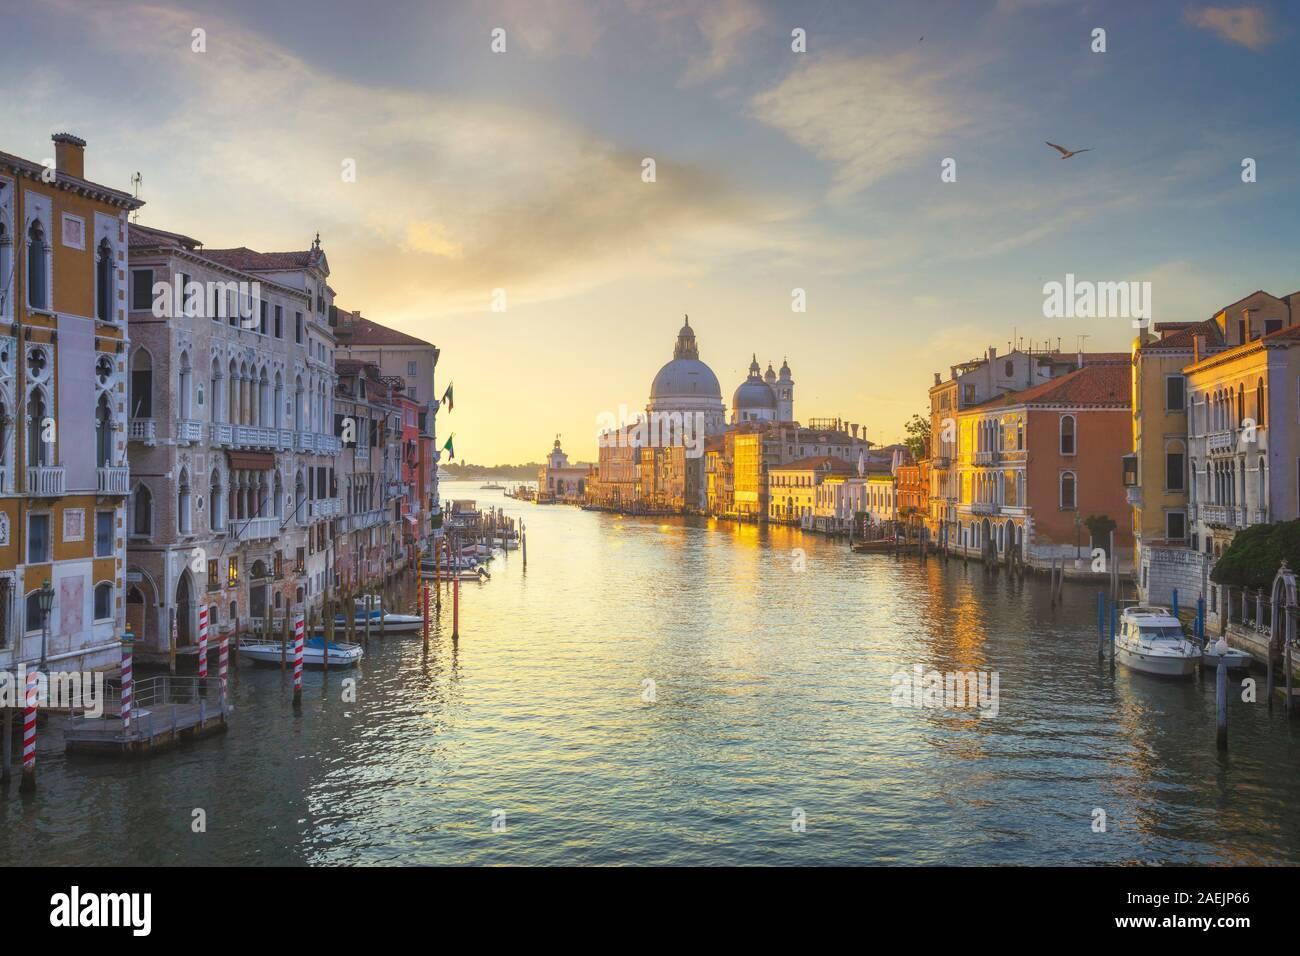 Blick auf den Canal Grande in Venedig, Santa Maria della Salute Kirche Sehenswürdigkeiten bei Sonnenaufgang. Italien, Europa. Stockfoto